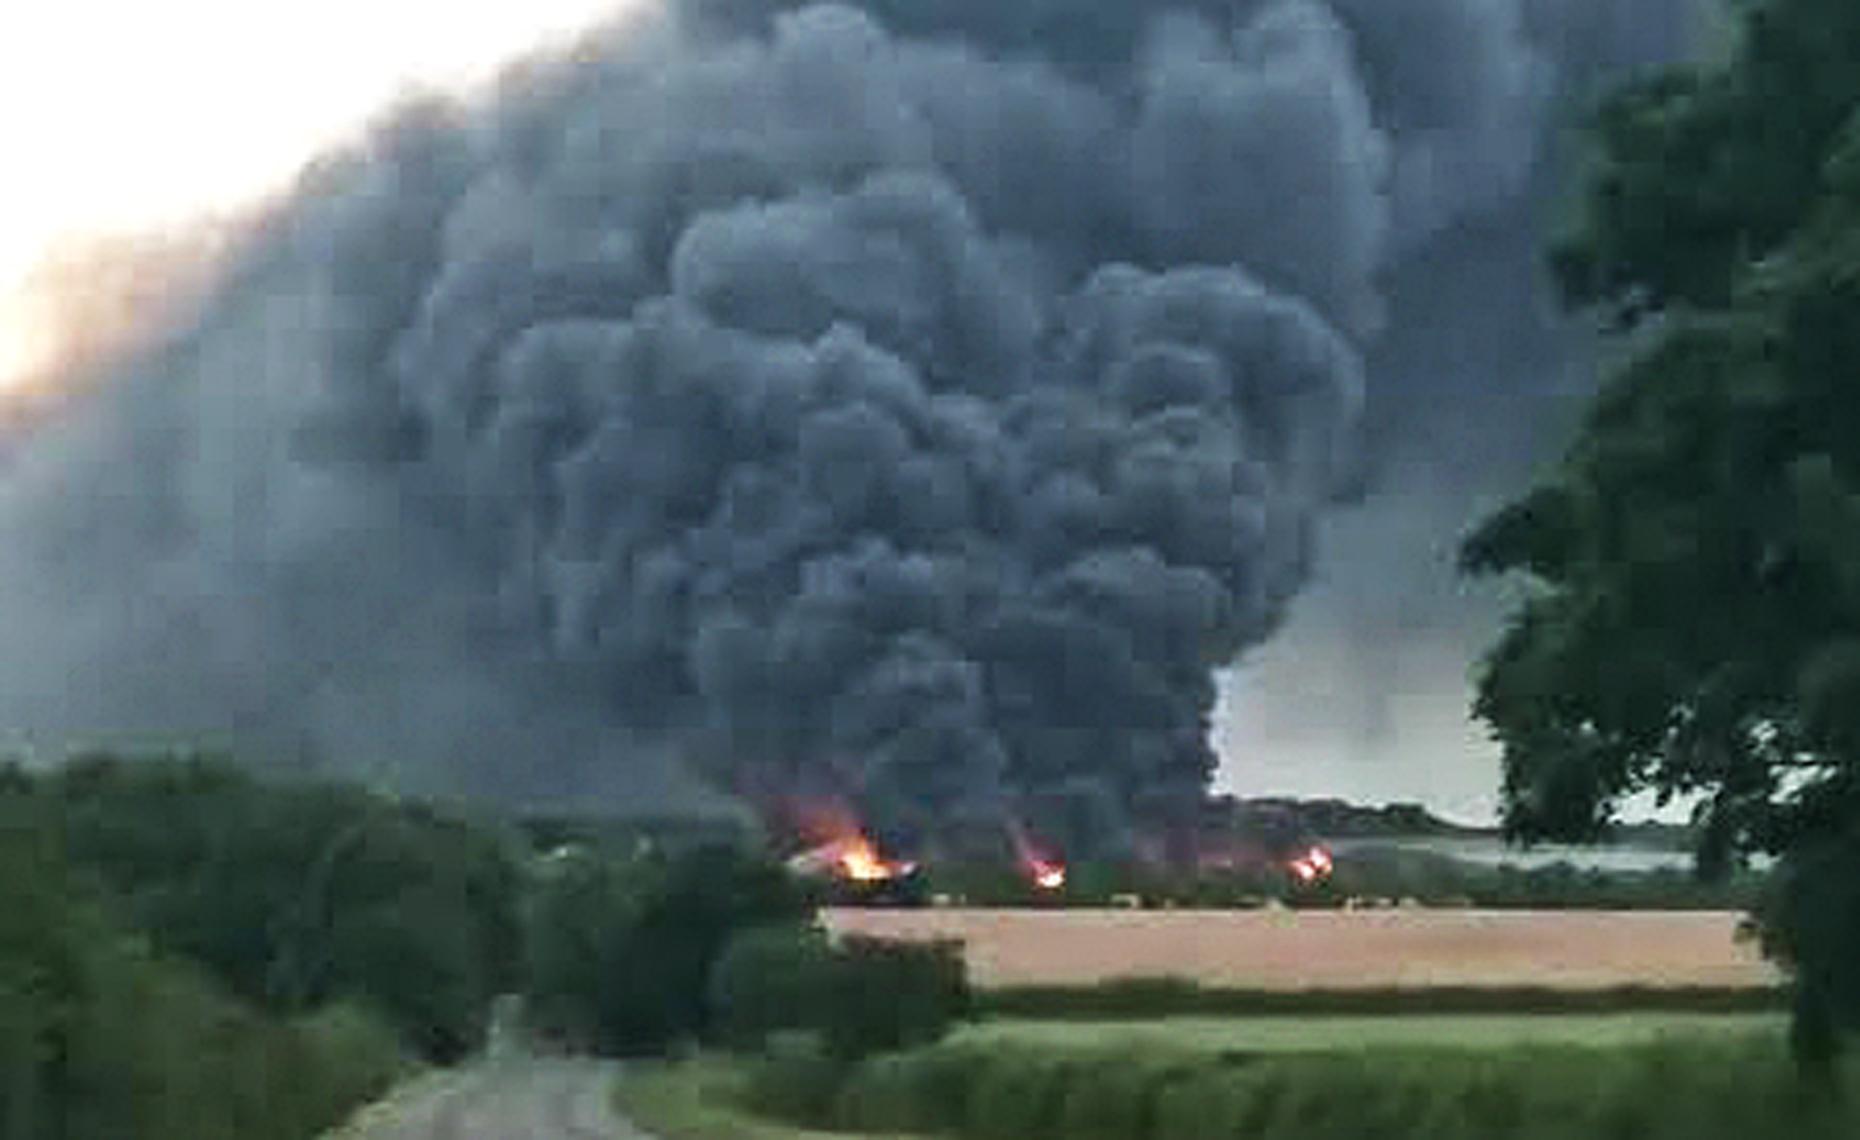 The fire has engulfed around 4,000 bales of waste. Photo: Simon Meadows